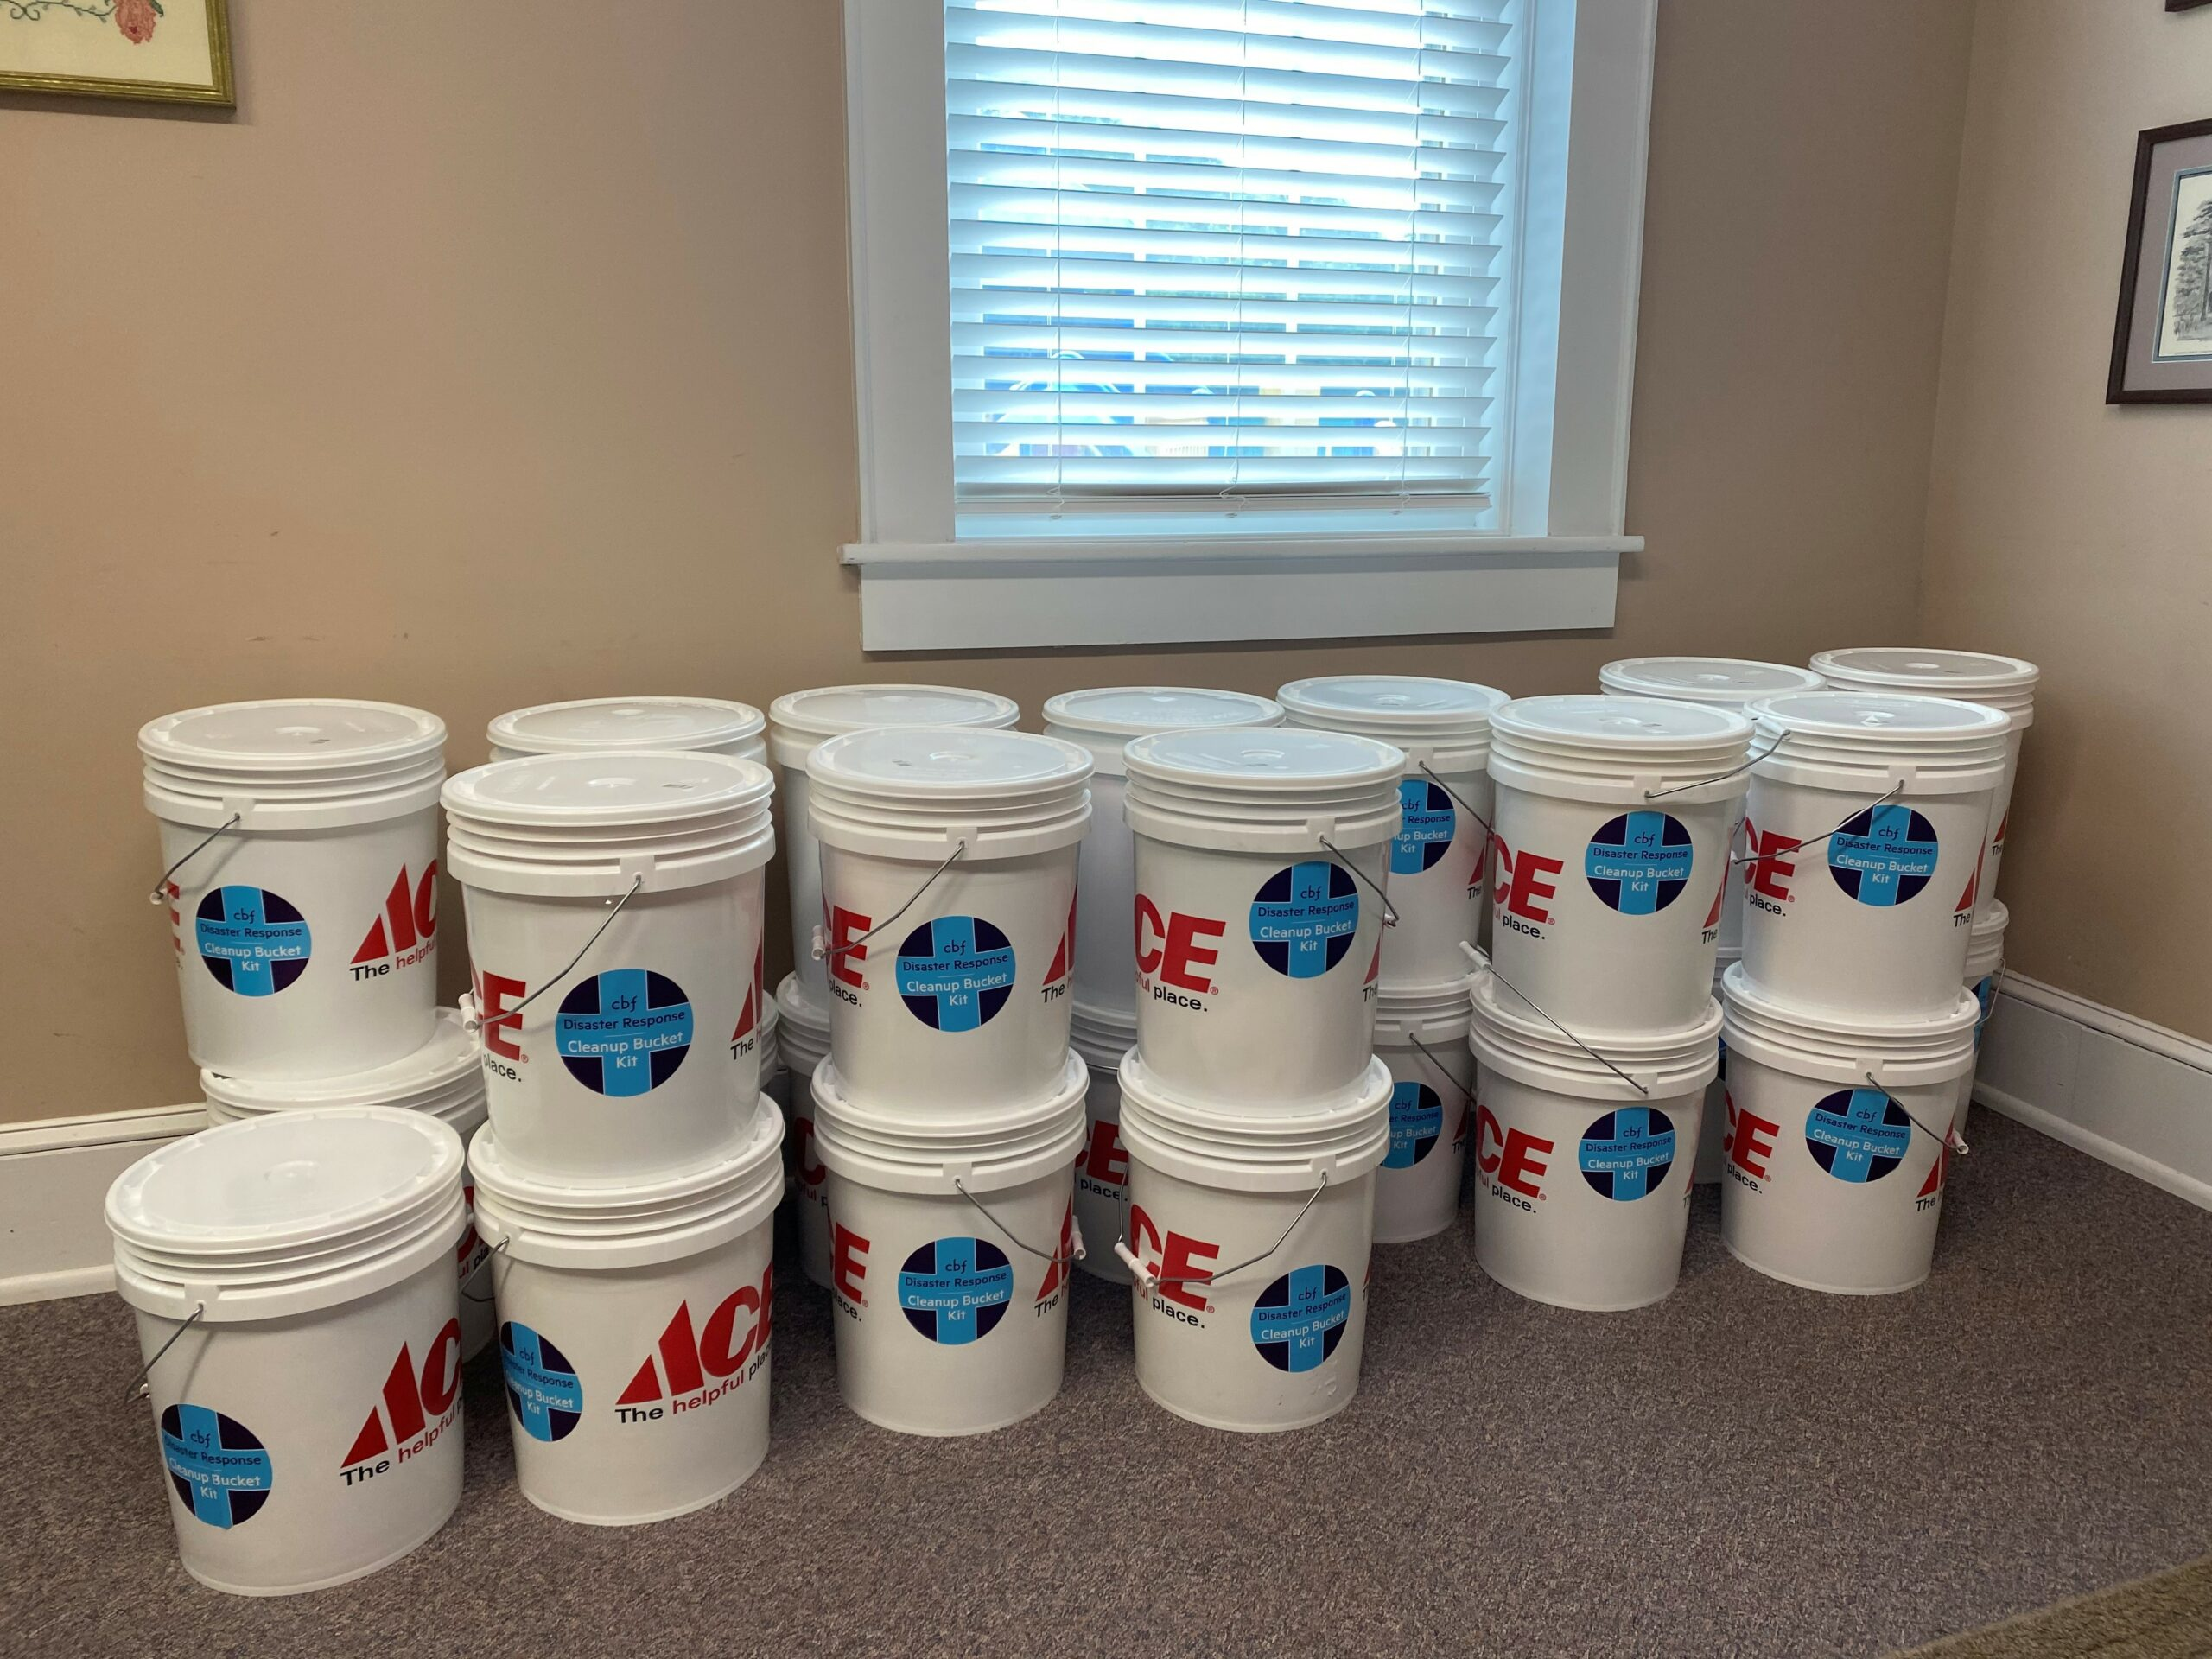 flood relief buckets